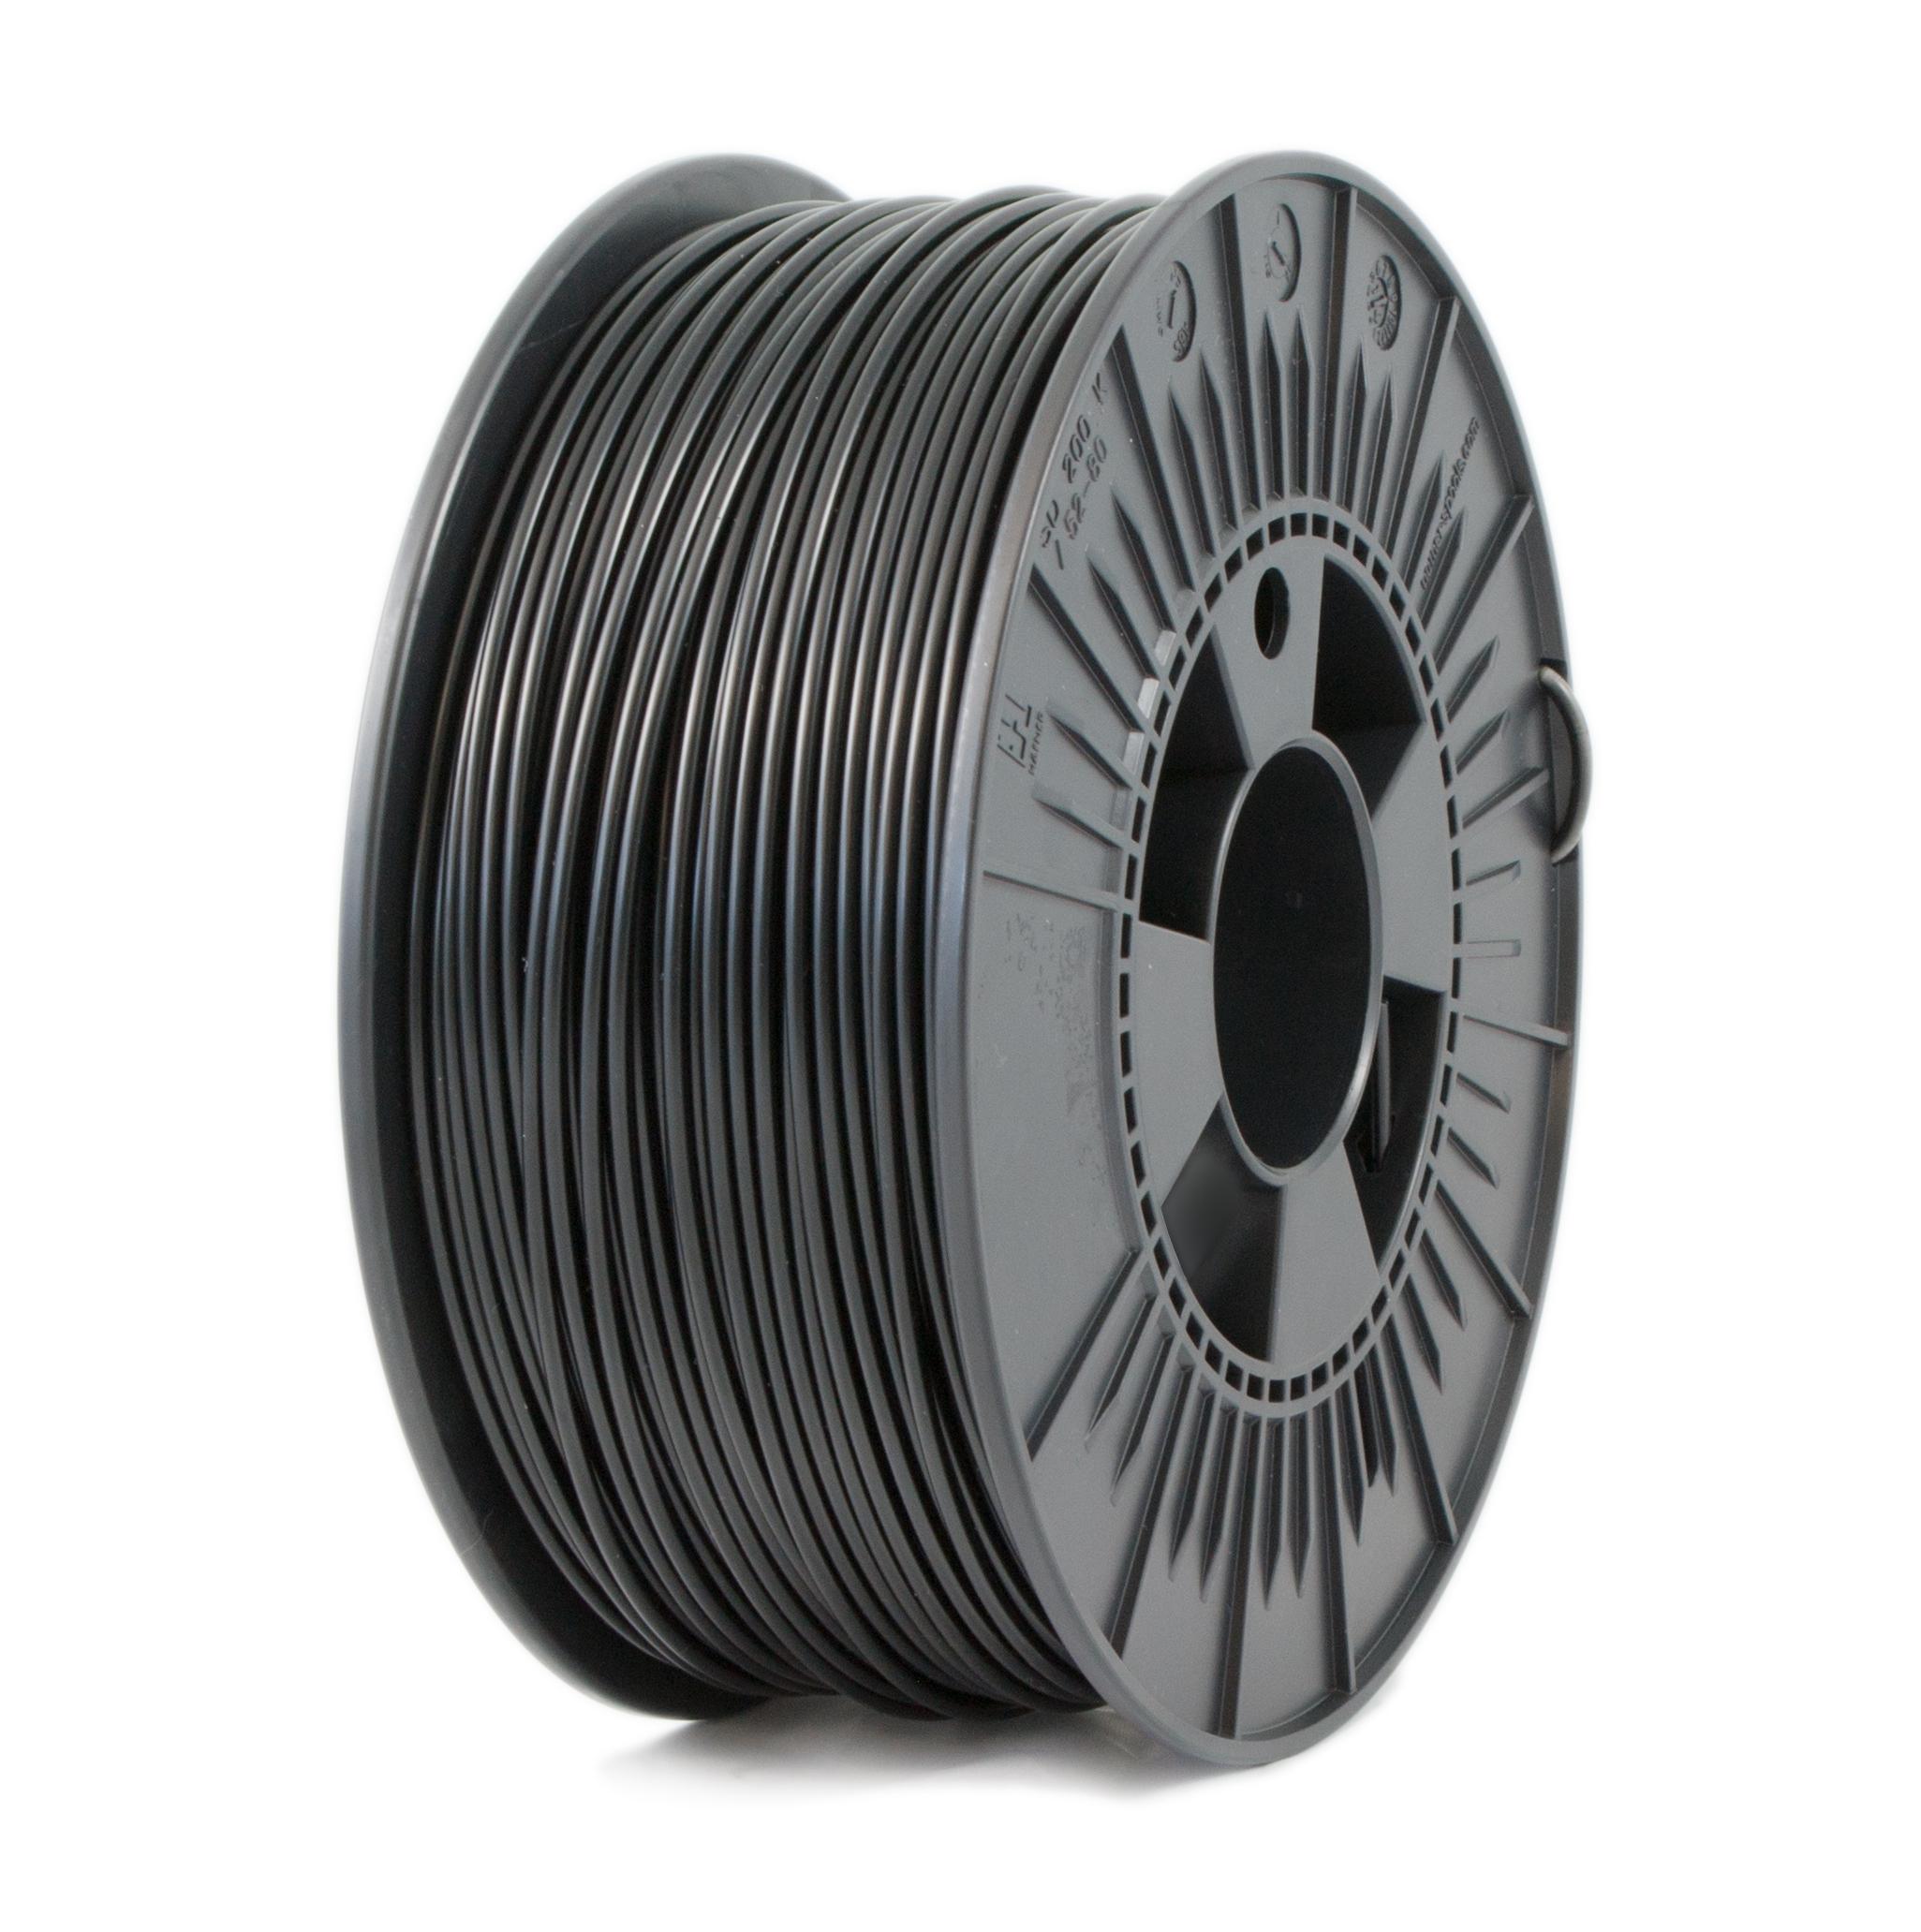 Filamentive  Black PLA 2.85 mm